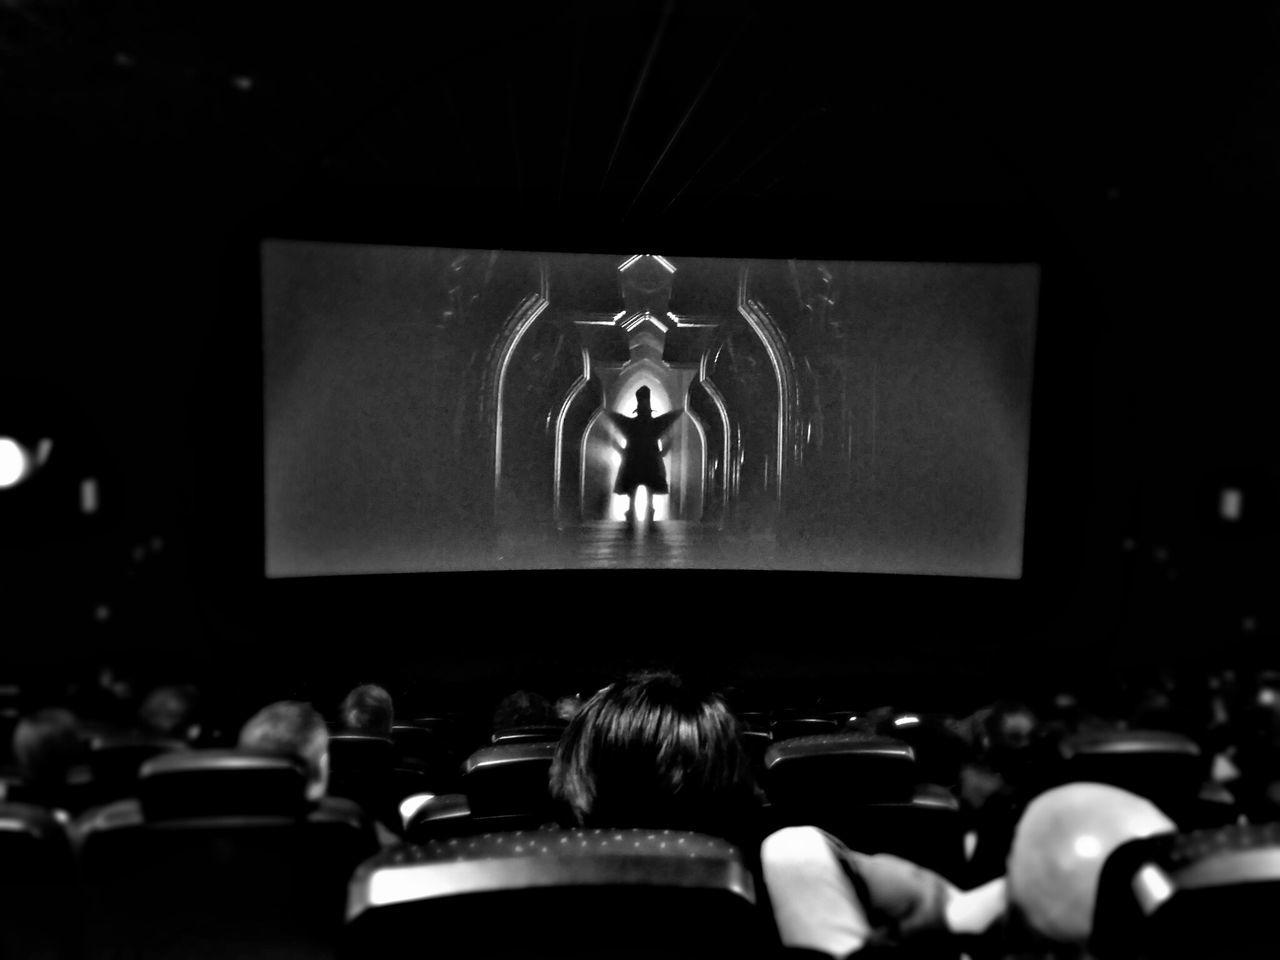 Cinema In Your Life Cinema Film CinemaTime Blackandwhite Blackandwhite Photography Evening Time Relaxing Relaxing Time Watching A Movie Watching Movies Guardando Un Film